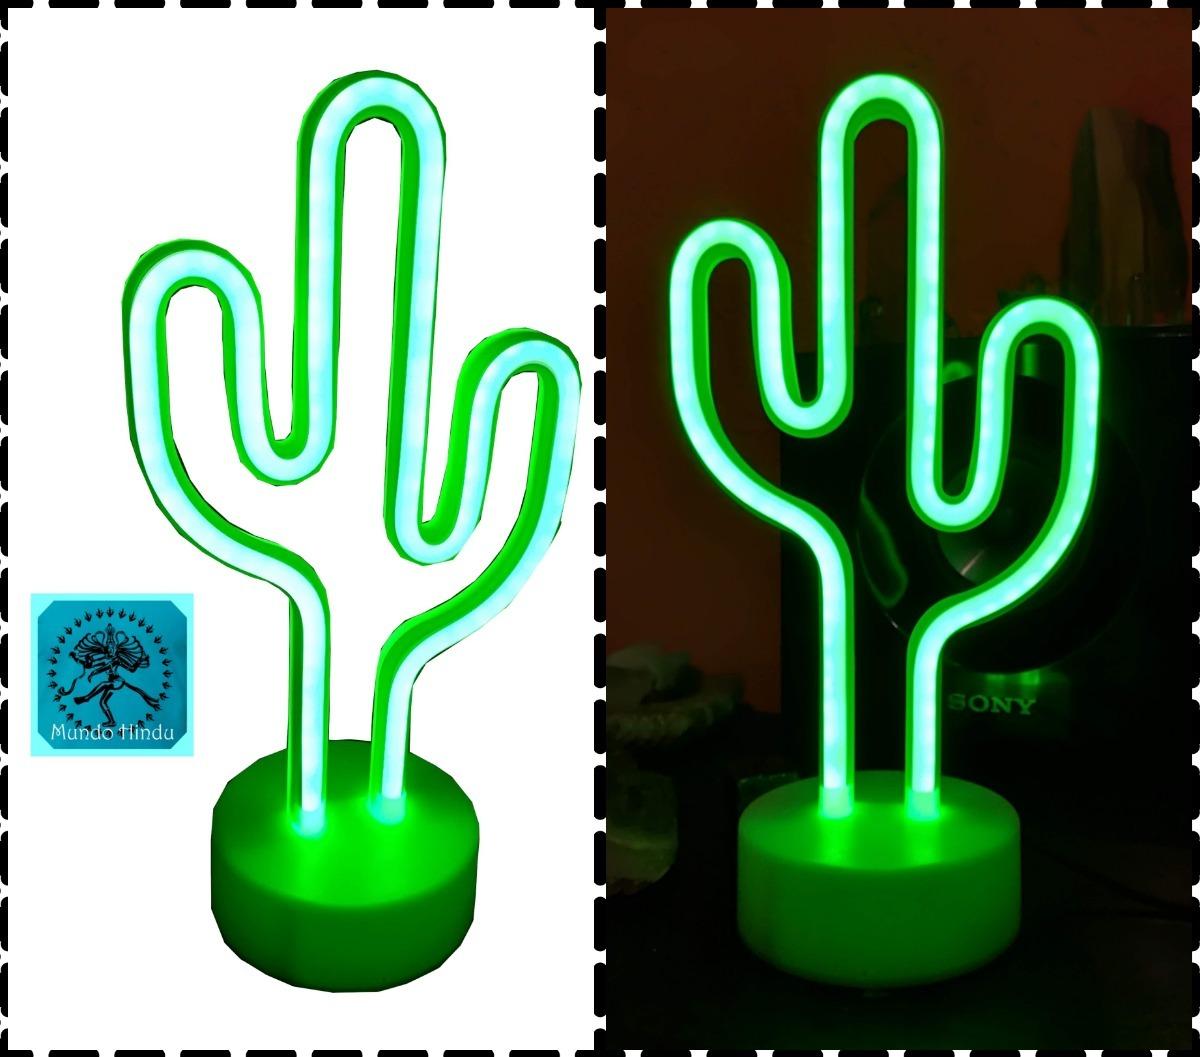 Deco Neon Luz Lampara De Bajo Cactus Consumo Simil Led wOkZulTPXi